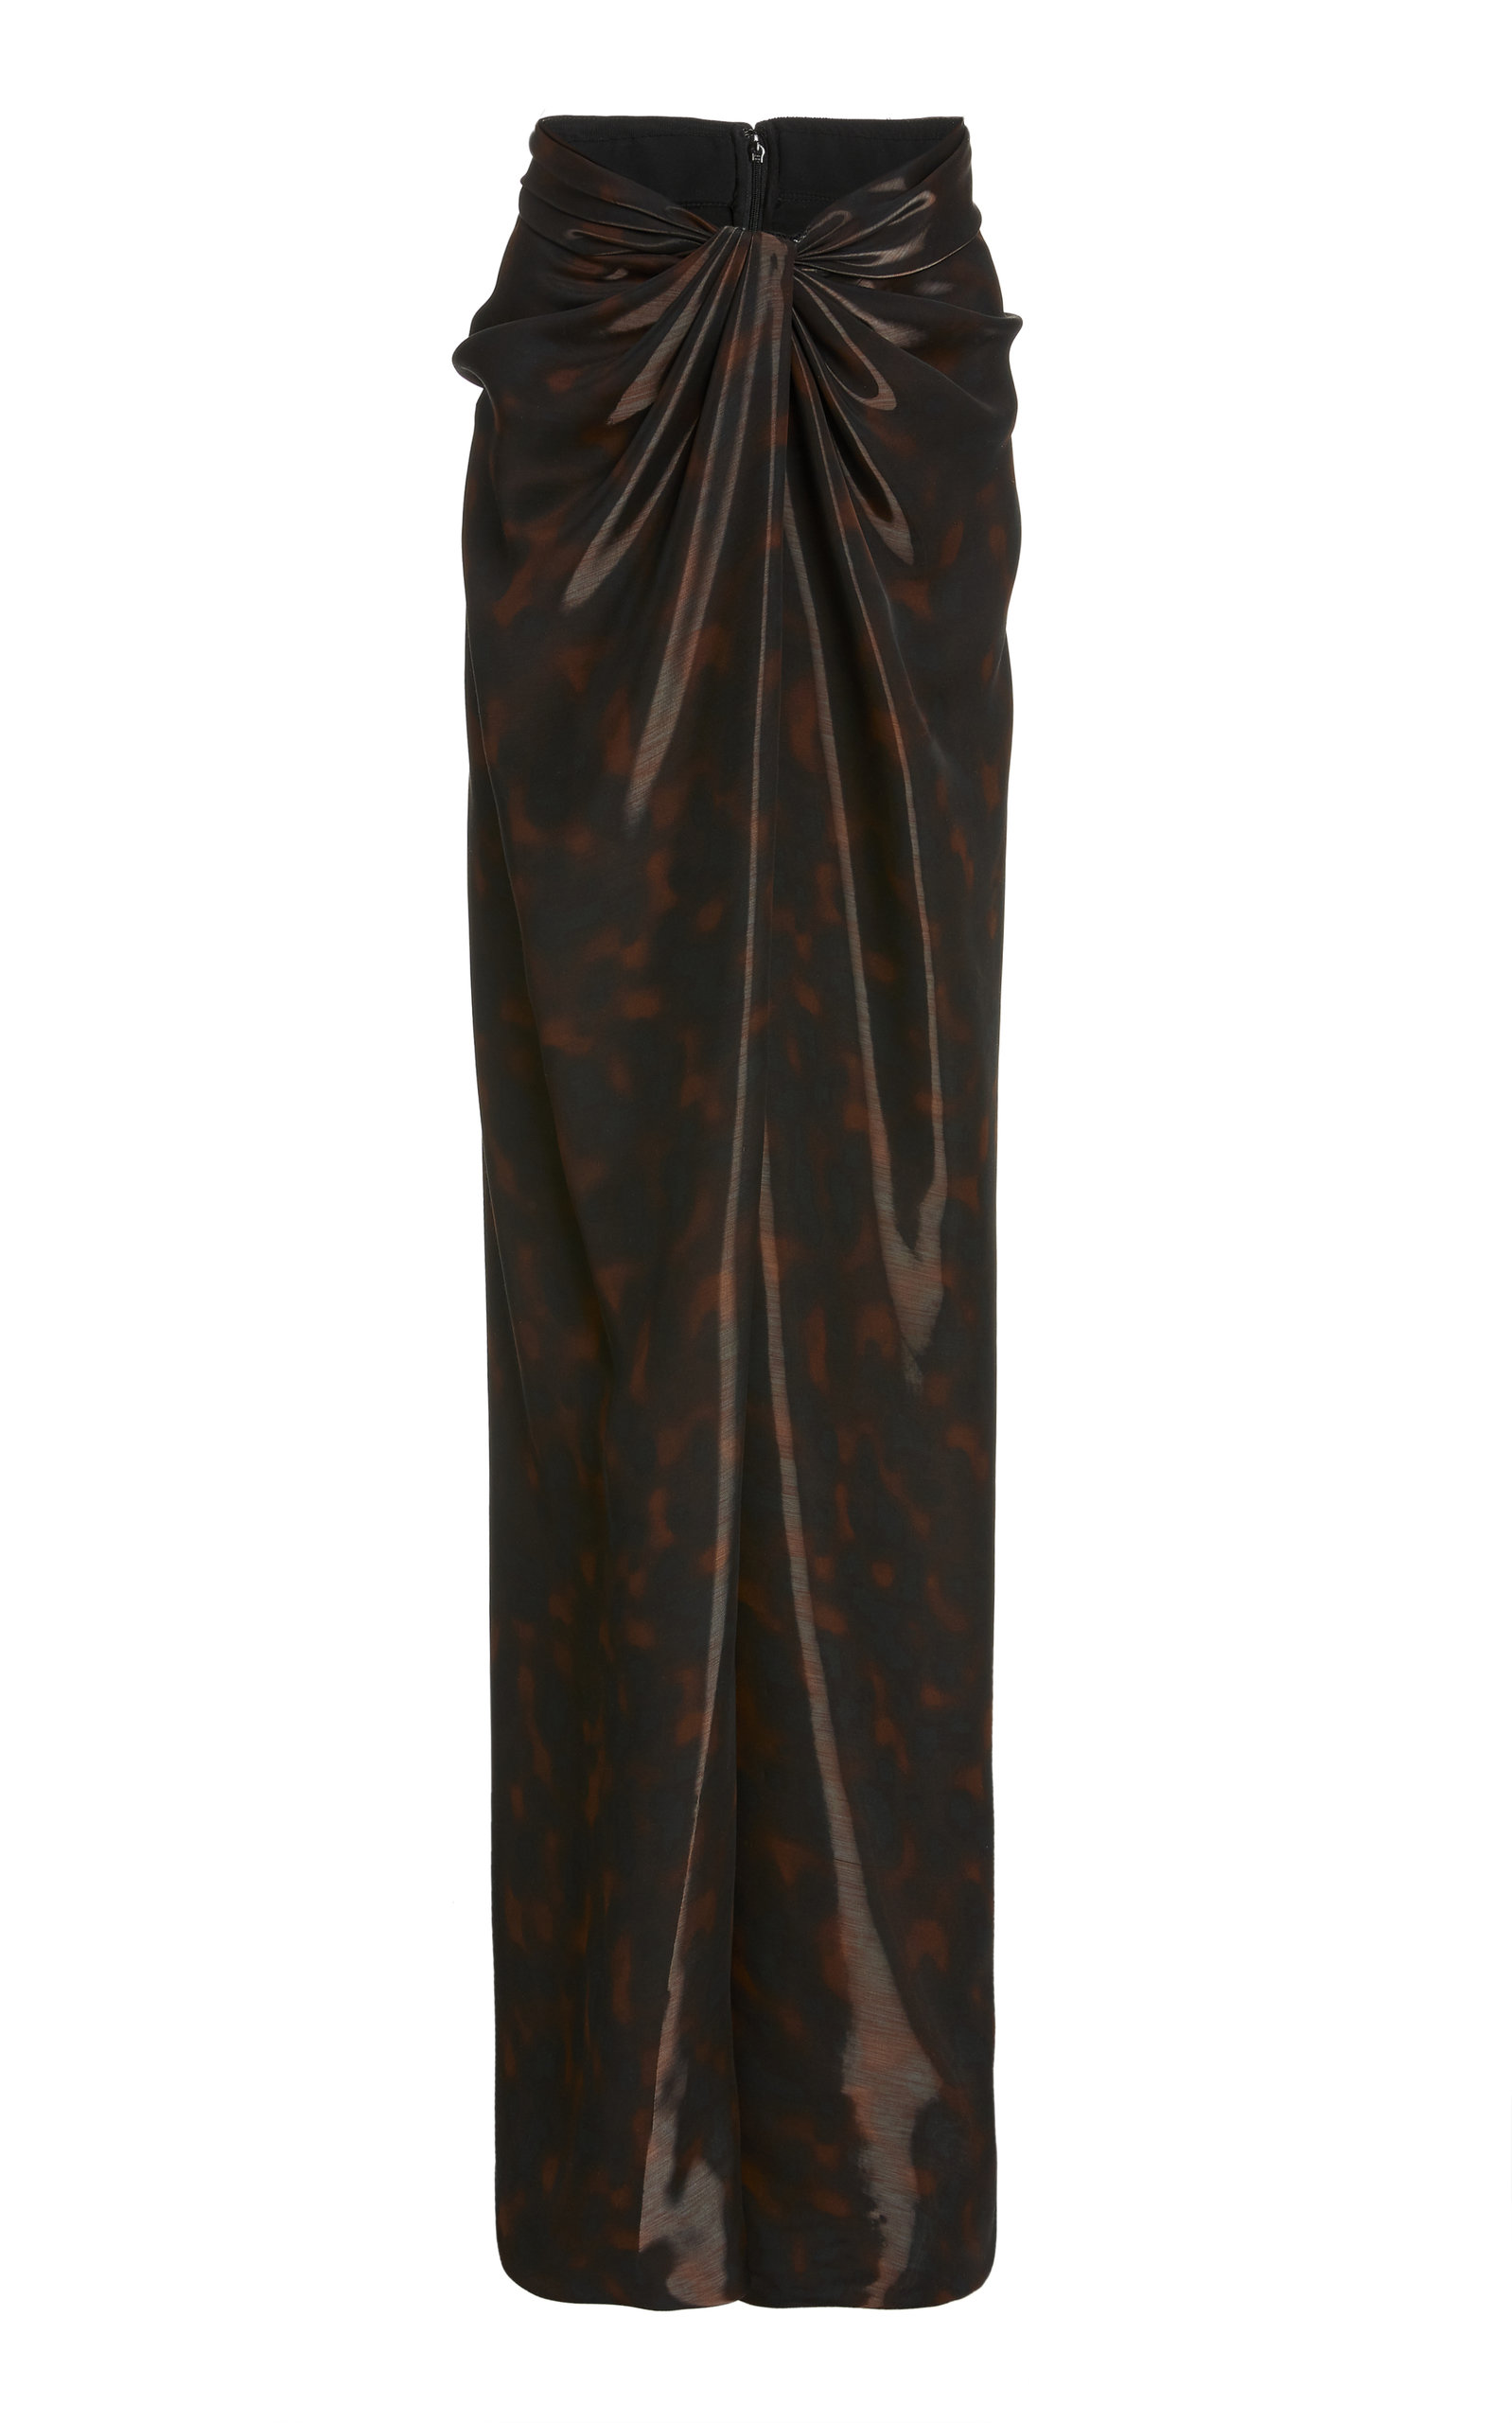 Women's Liquid Tortoiseshell Wrap-Effect Maxi Skirt